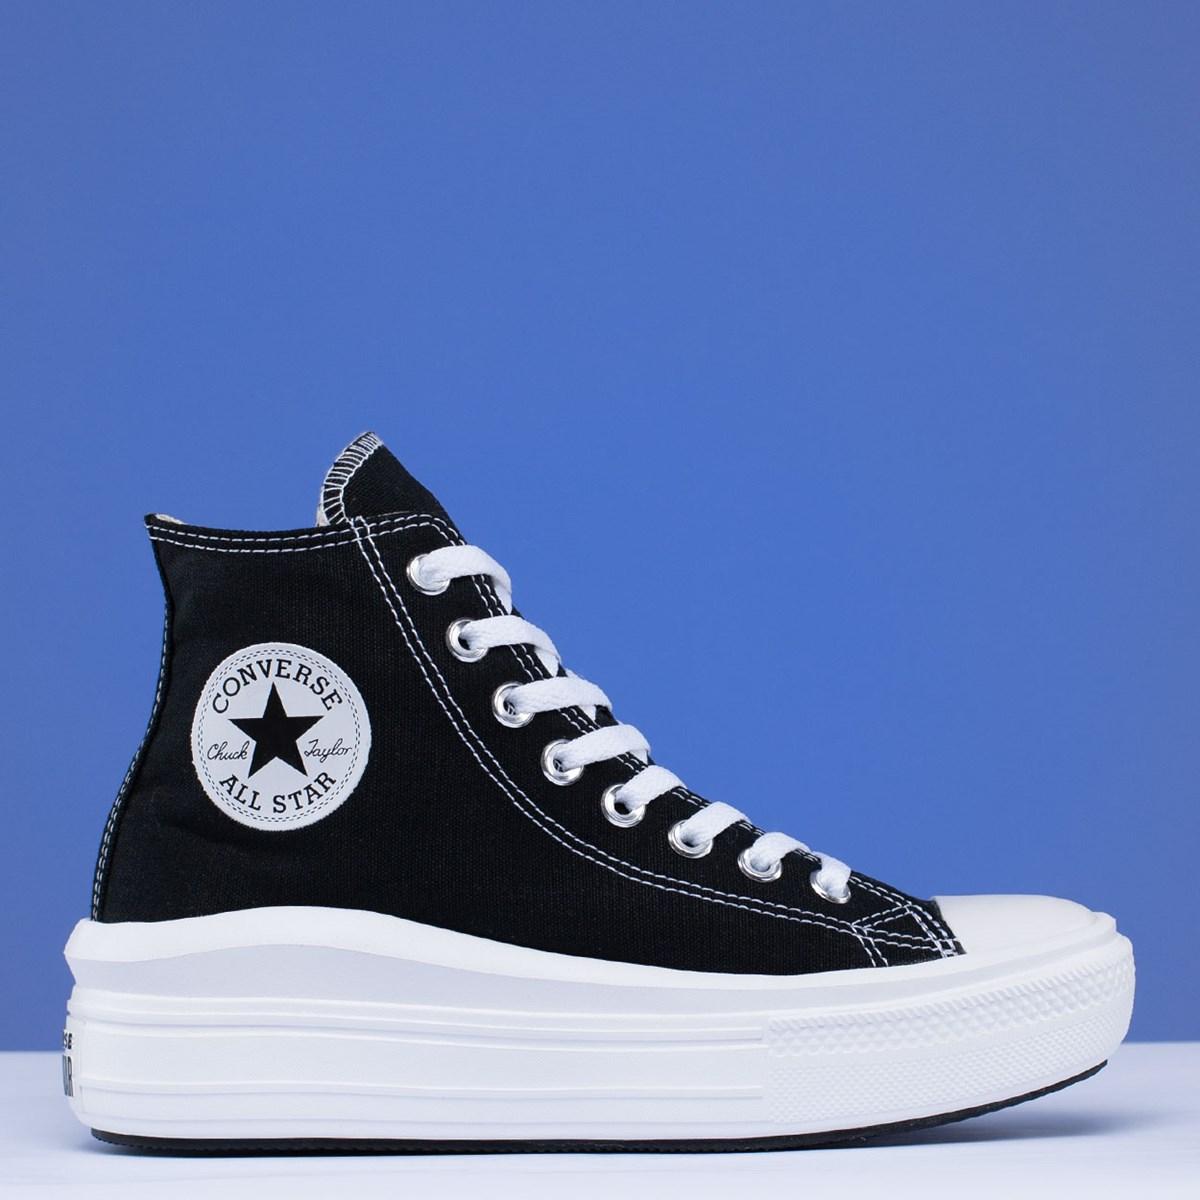 Tênis Converse Chuck Taylor All Star Move Mix And Match Hi Black Natural Ivory 568497C